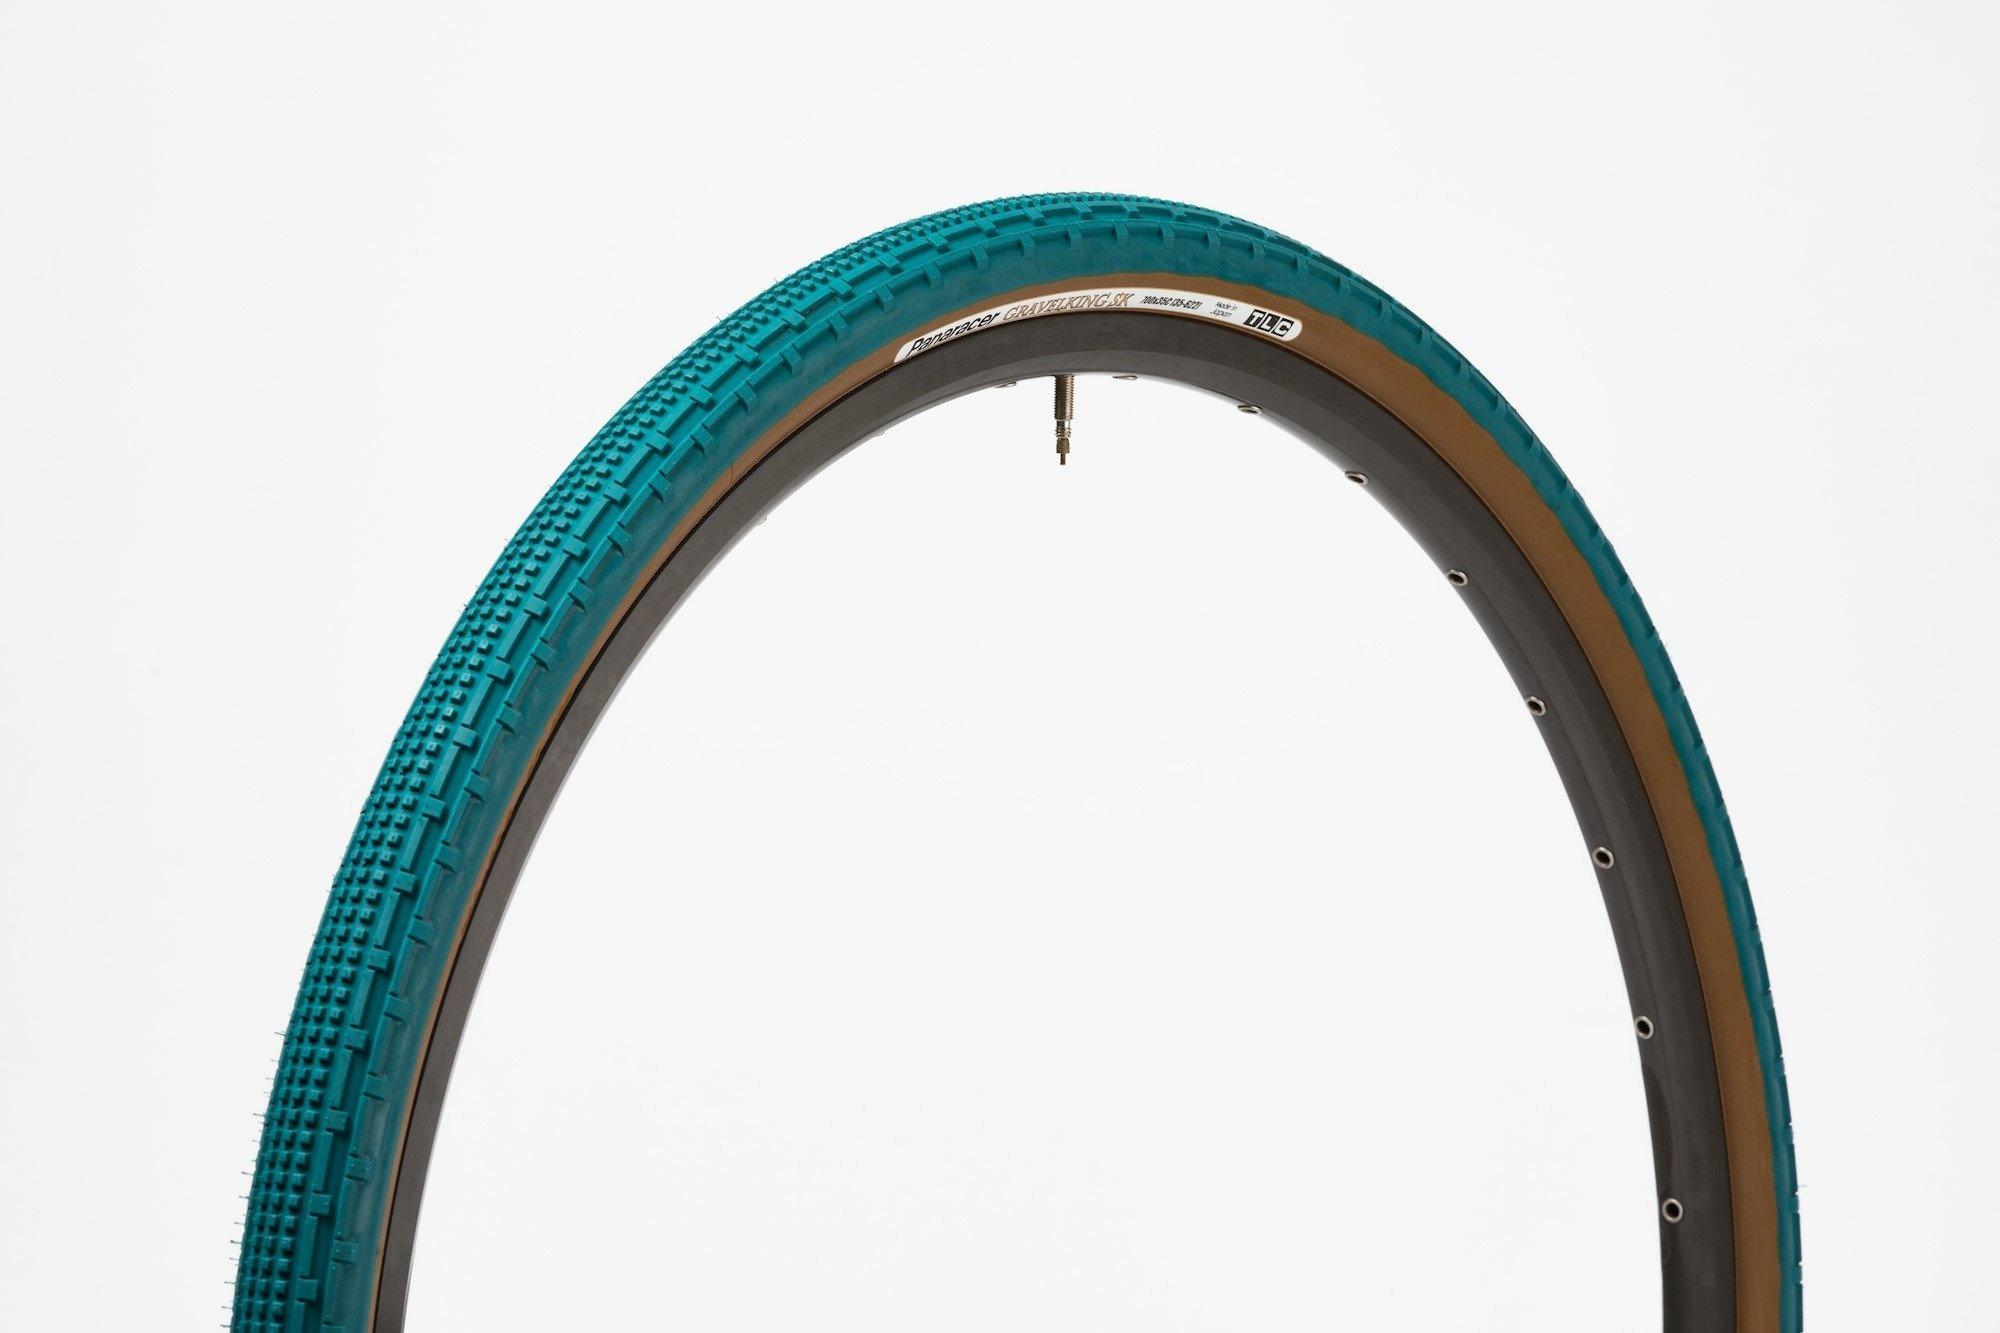 Panaracer 700 x 38 Gravel King SK Nile Blue dæk